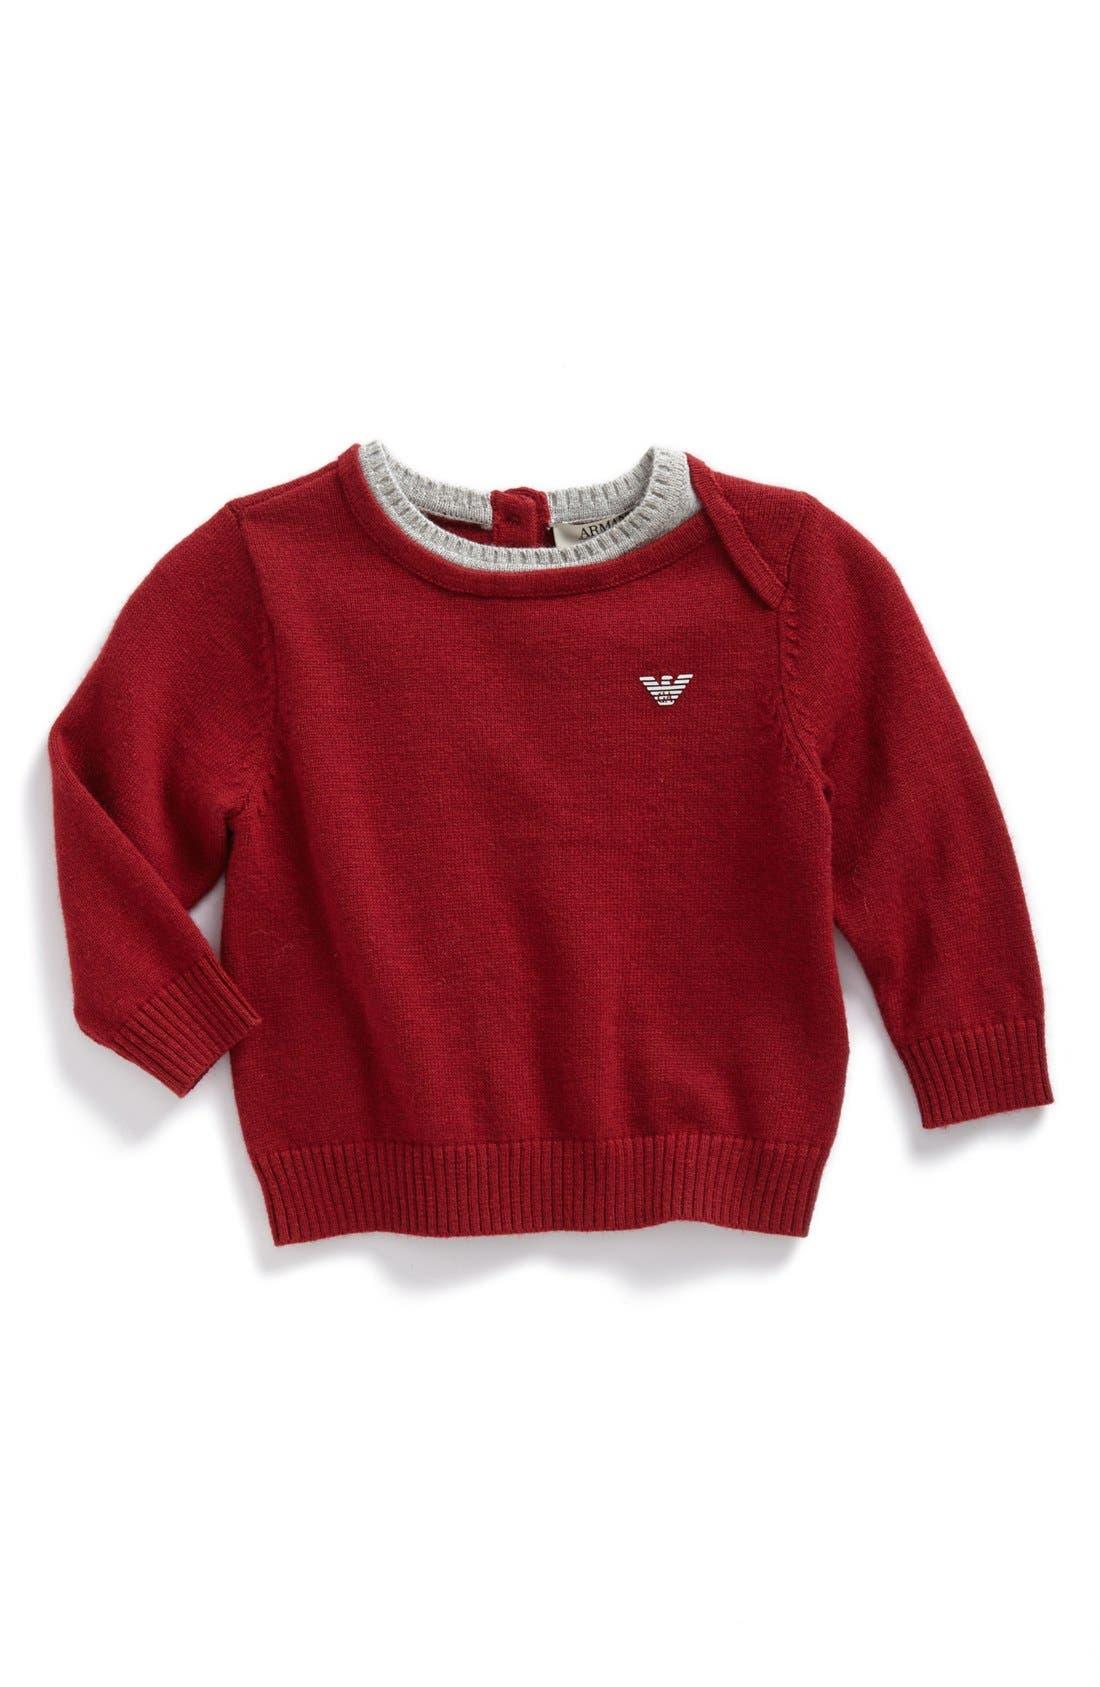 Alternate Image 1 Selected - Armani Junior Knit Sweater (Baby Boys)